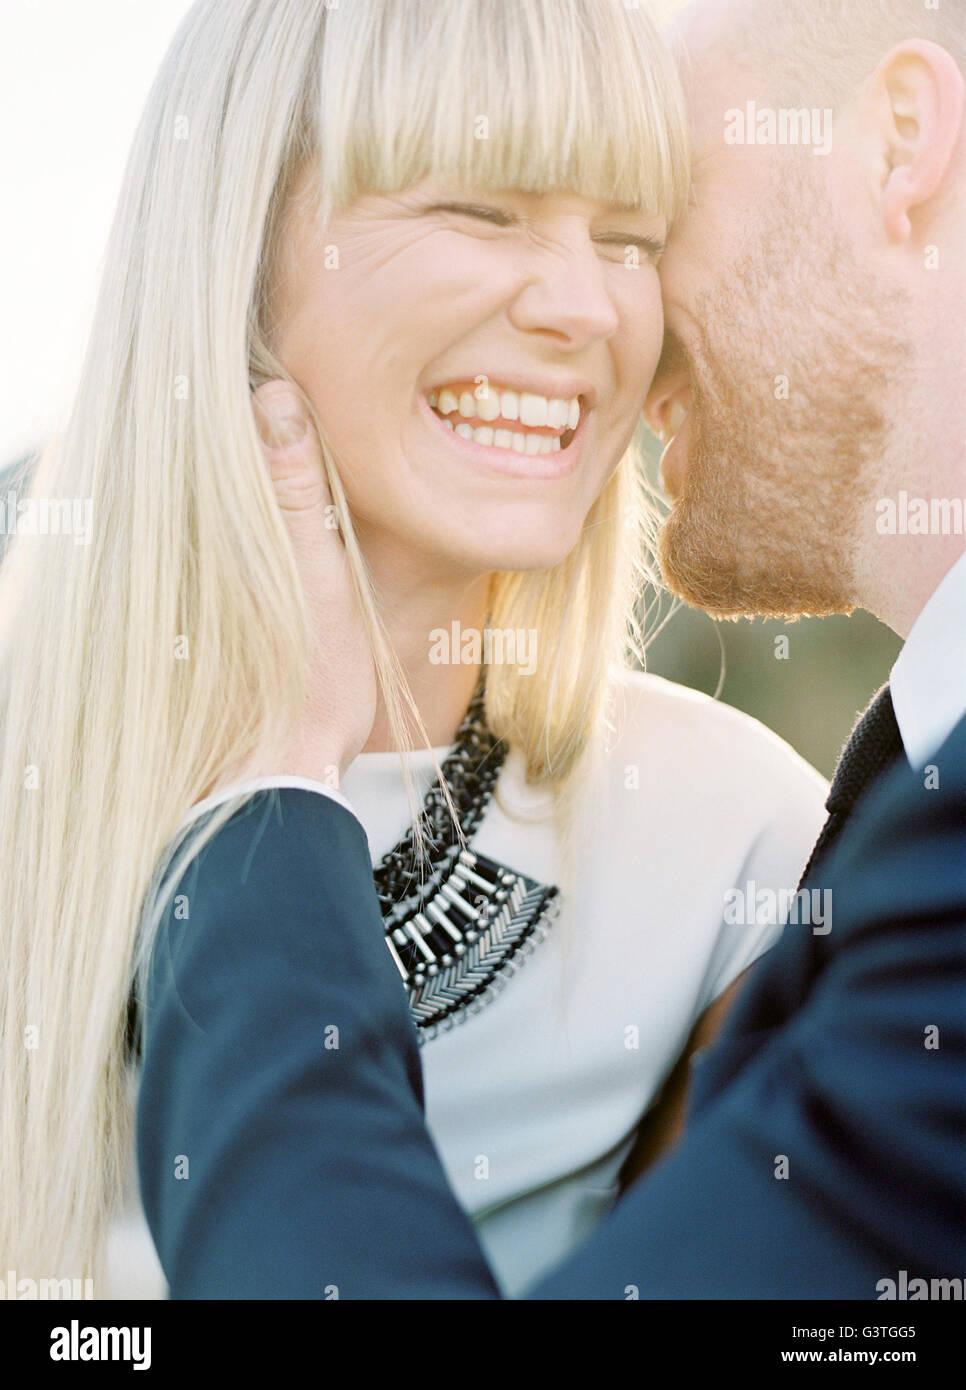 La Suède, Groom kissing bride's cheek Photo Stock